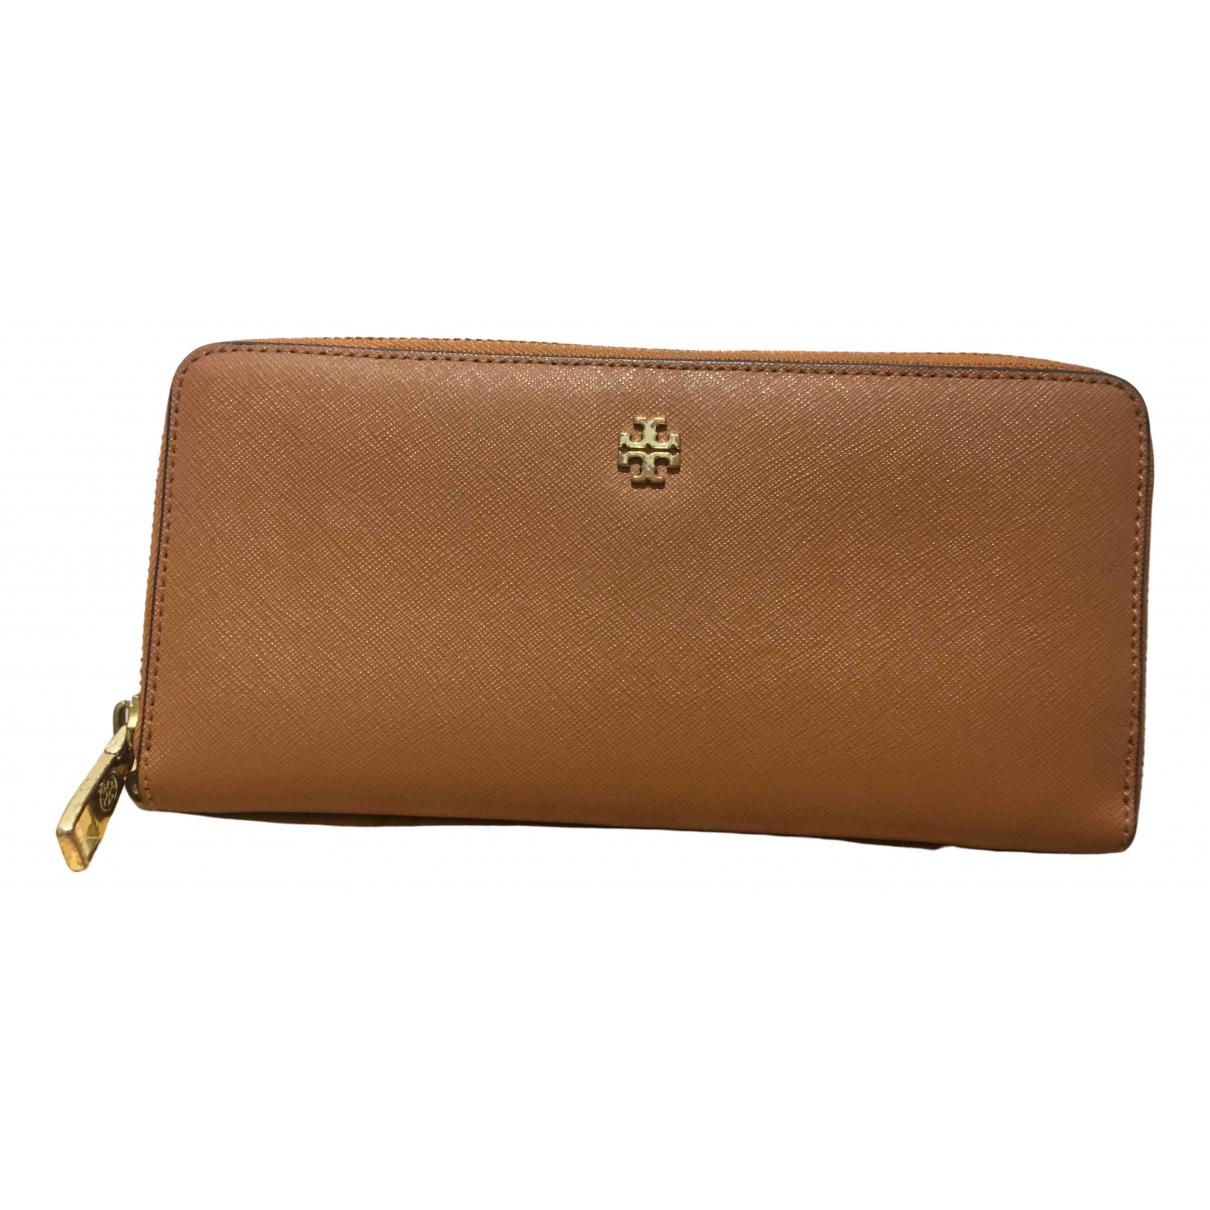 Tory Burch N Brown Leather wallet for Women N